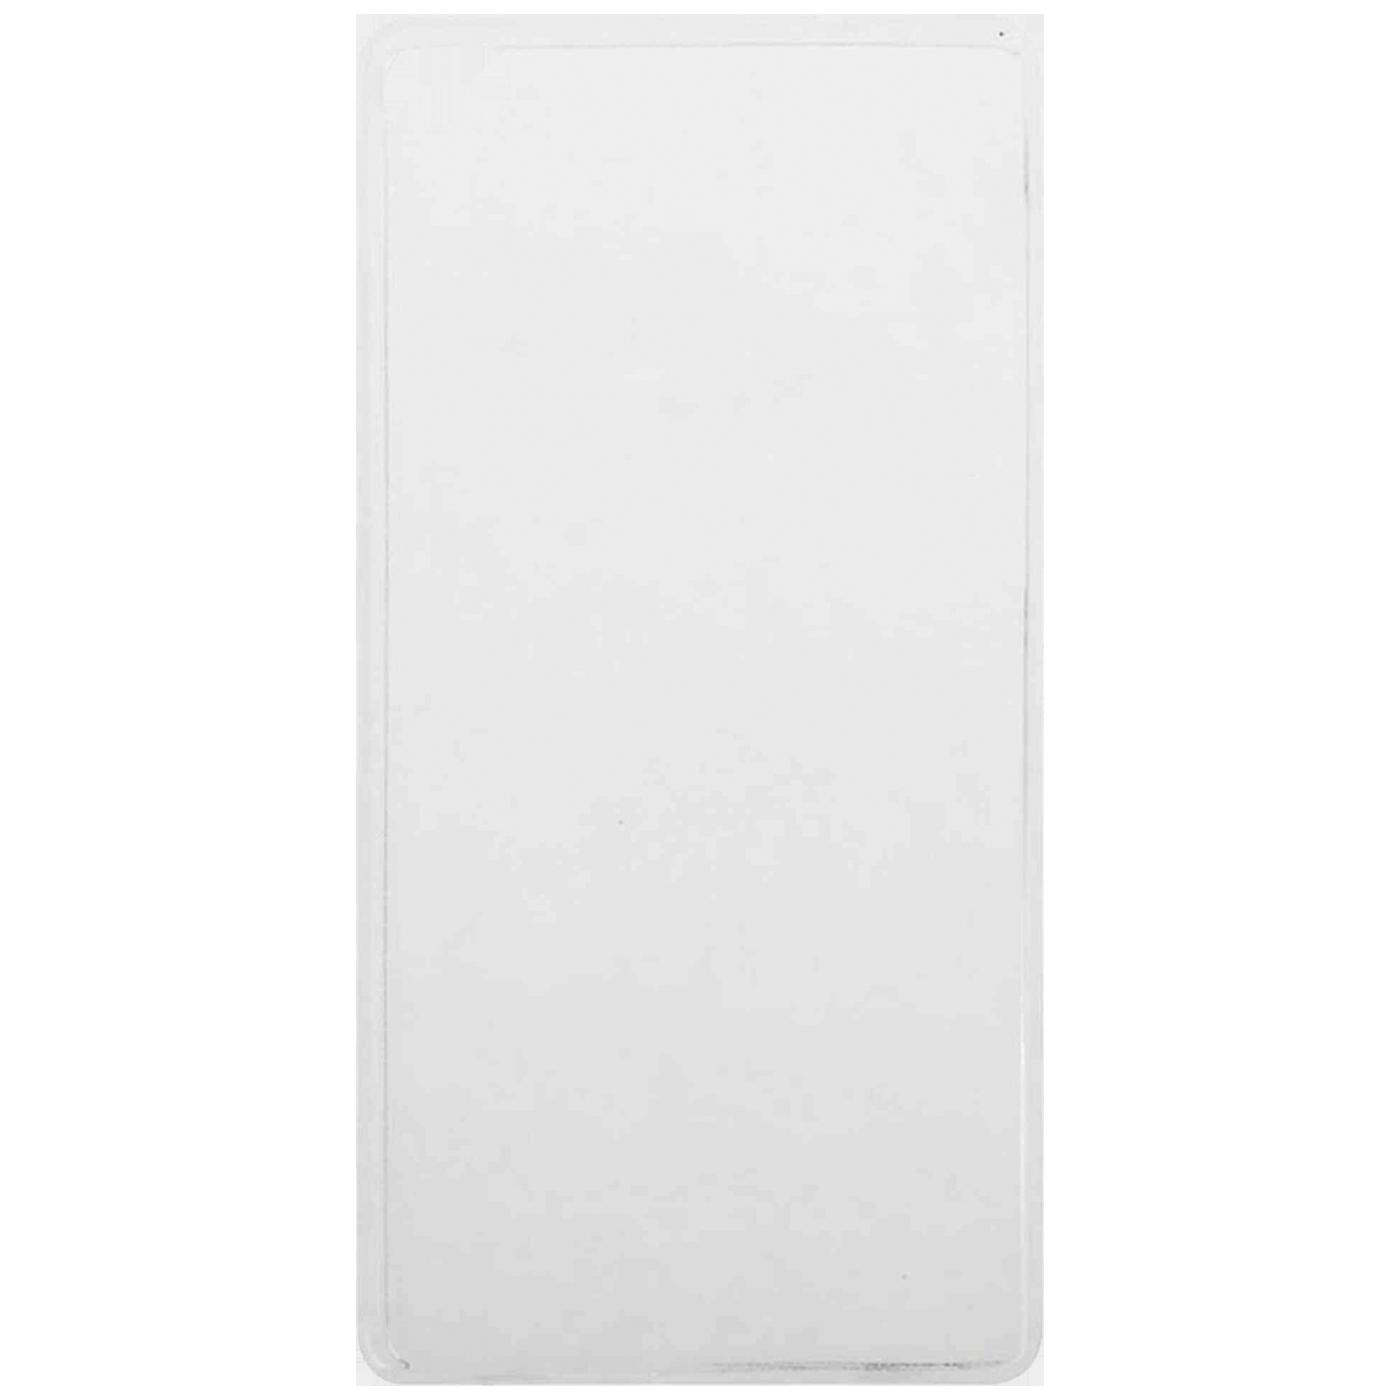 Futrola za mobitel Huawei P8, silikonska